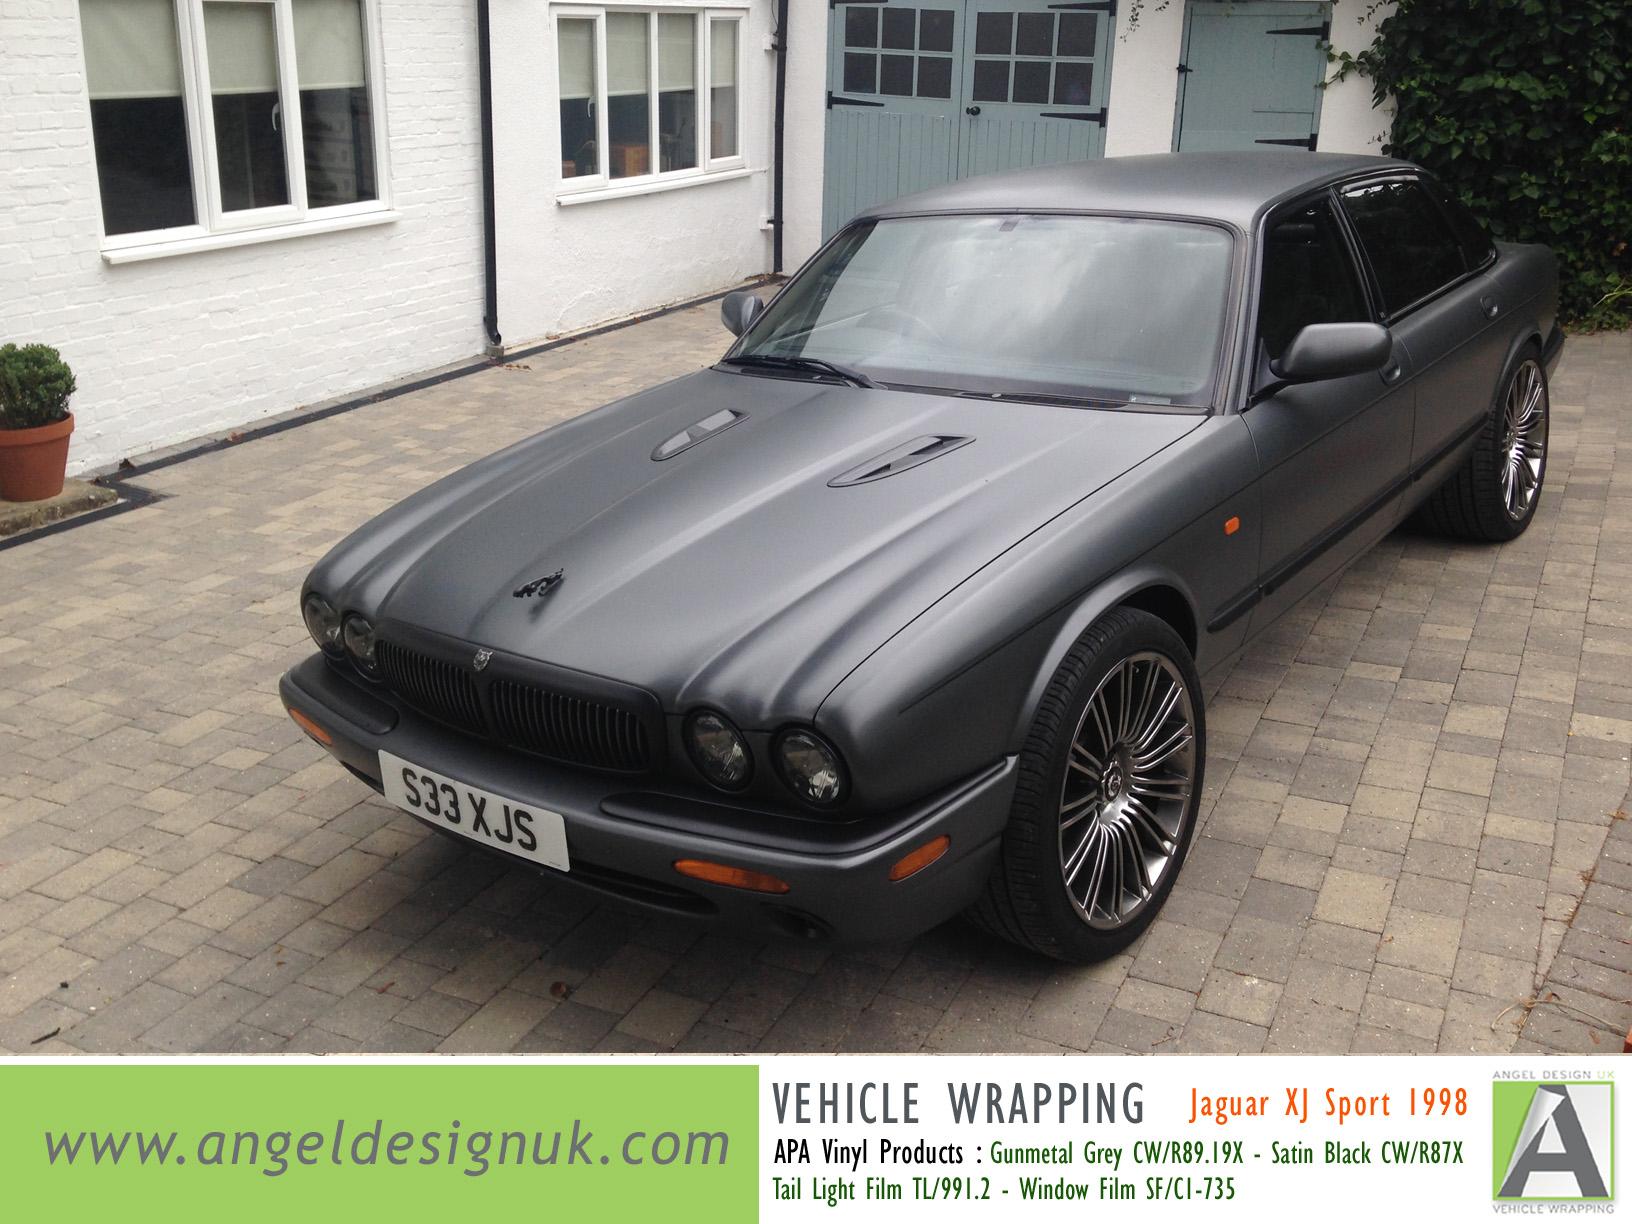 ANGEL DESIGN UK Vehicle Wrapping Jaguar XJ Sport 1998 Gunmetal Grey Pic 3